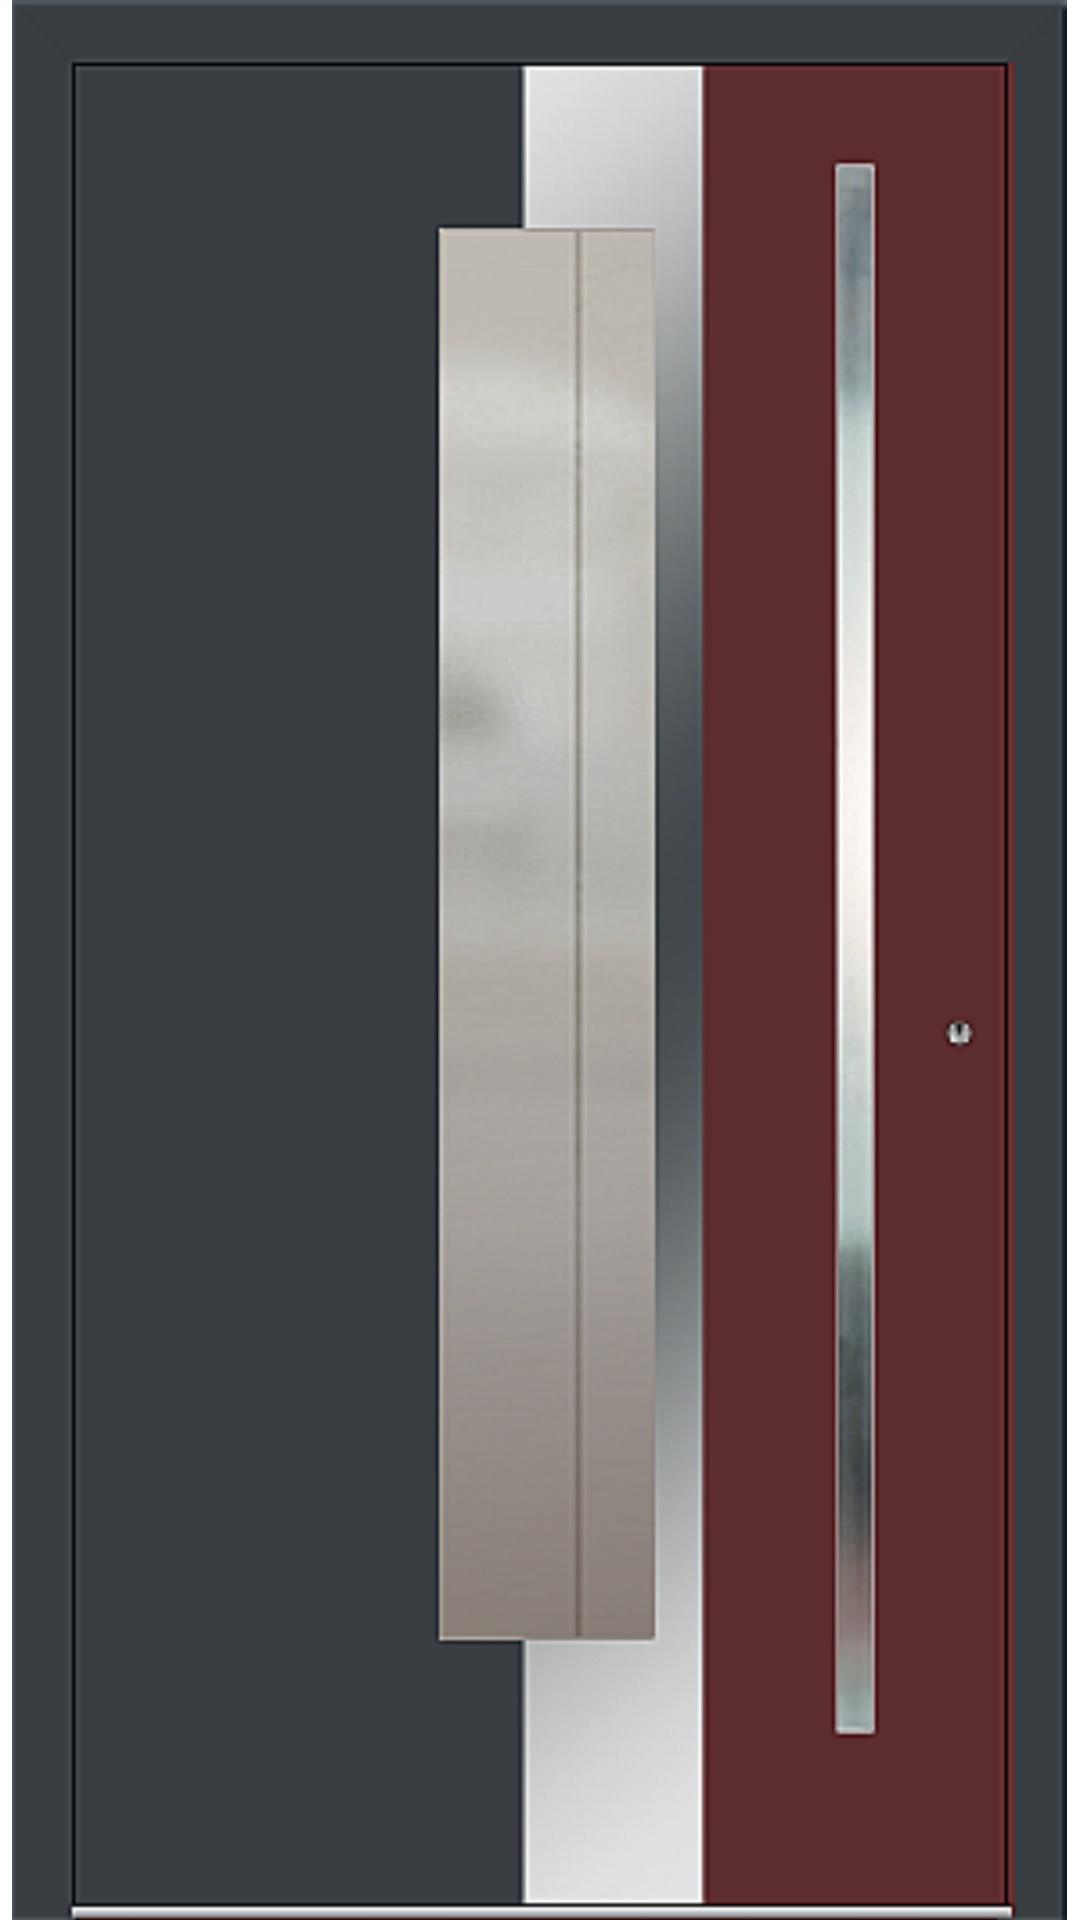 PaXentree Aluminium Haustür M02245 anthrazitgrau, purpurrot